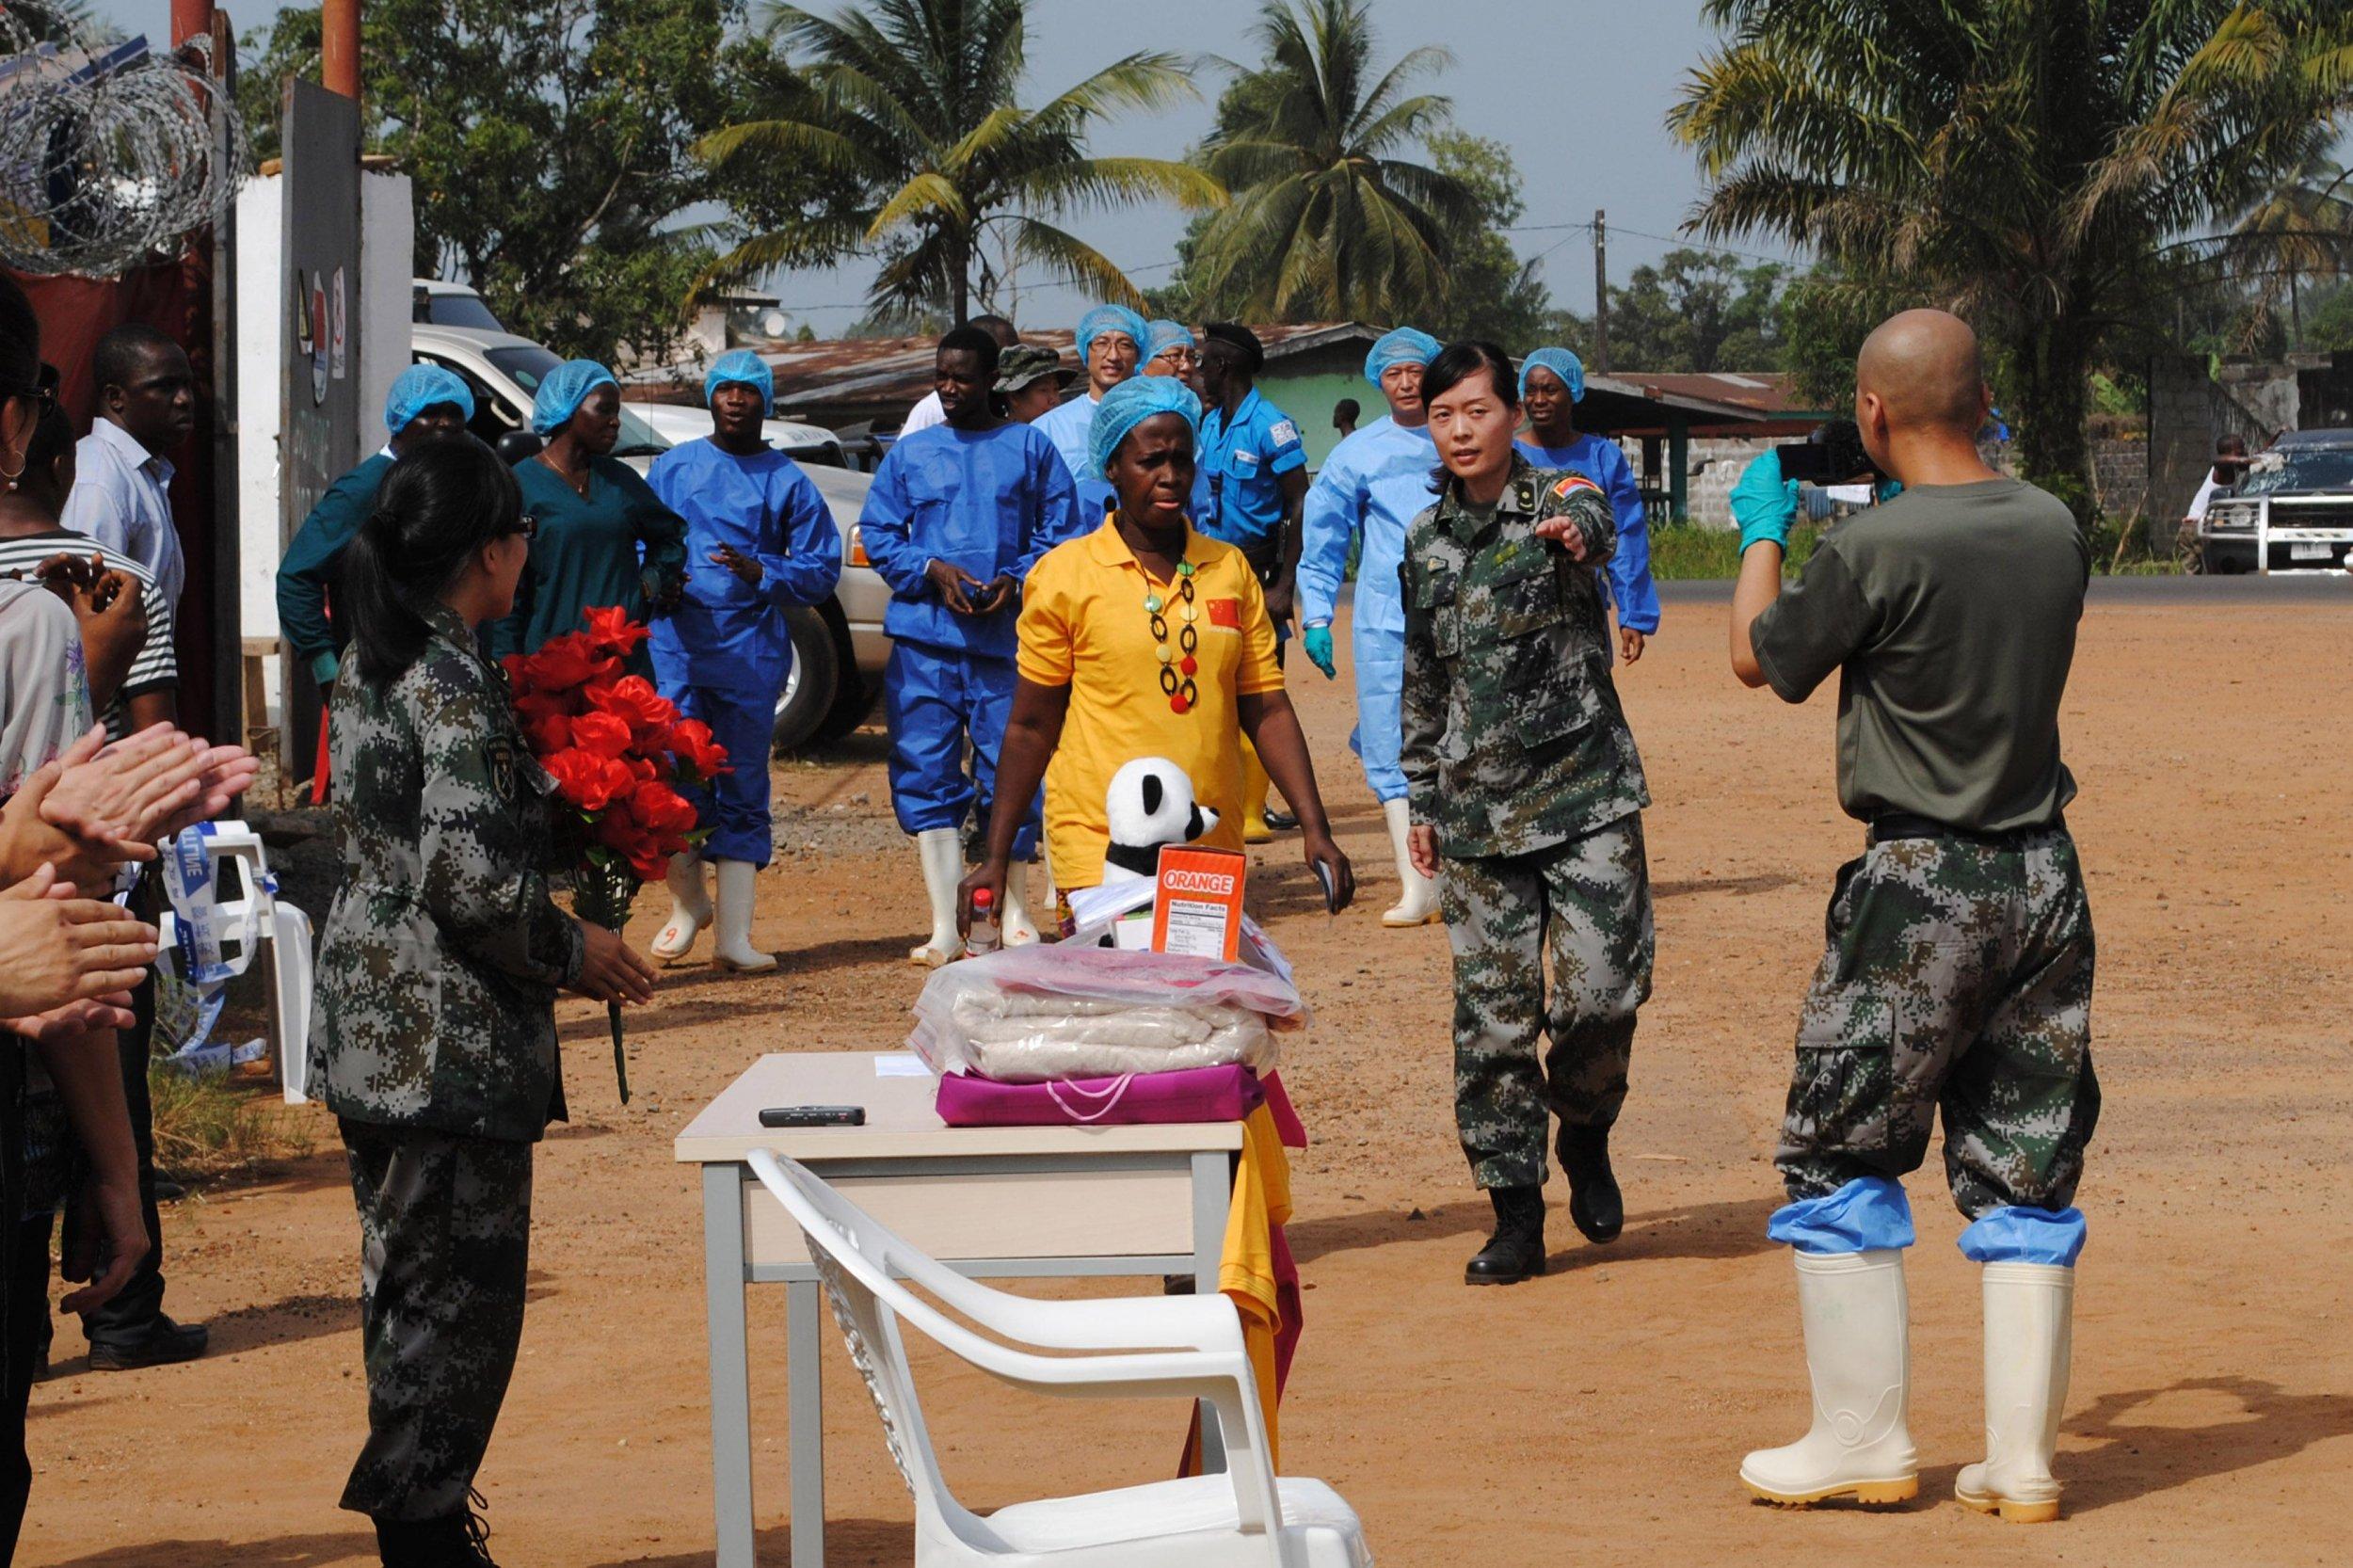 2015-03-05T172131Z_1206285734_GM1EB3603BQ01_RTRMADP_3_HEALTH-EBOLA-LIBERIA